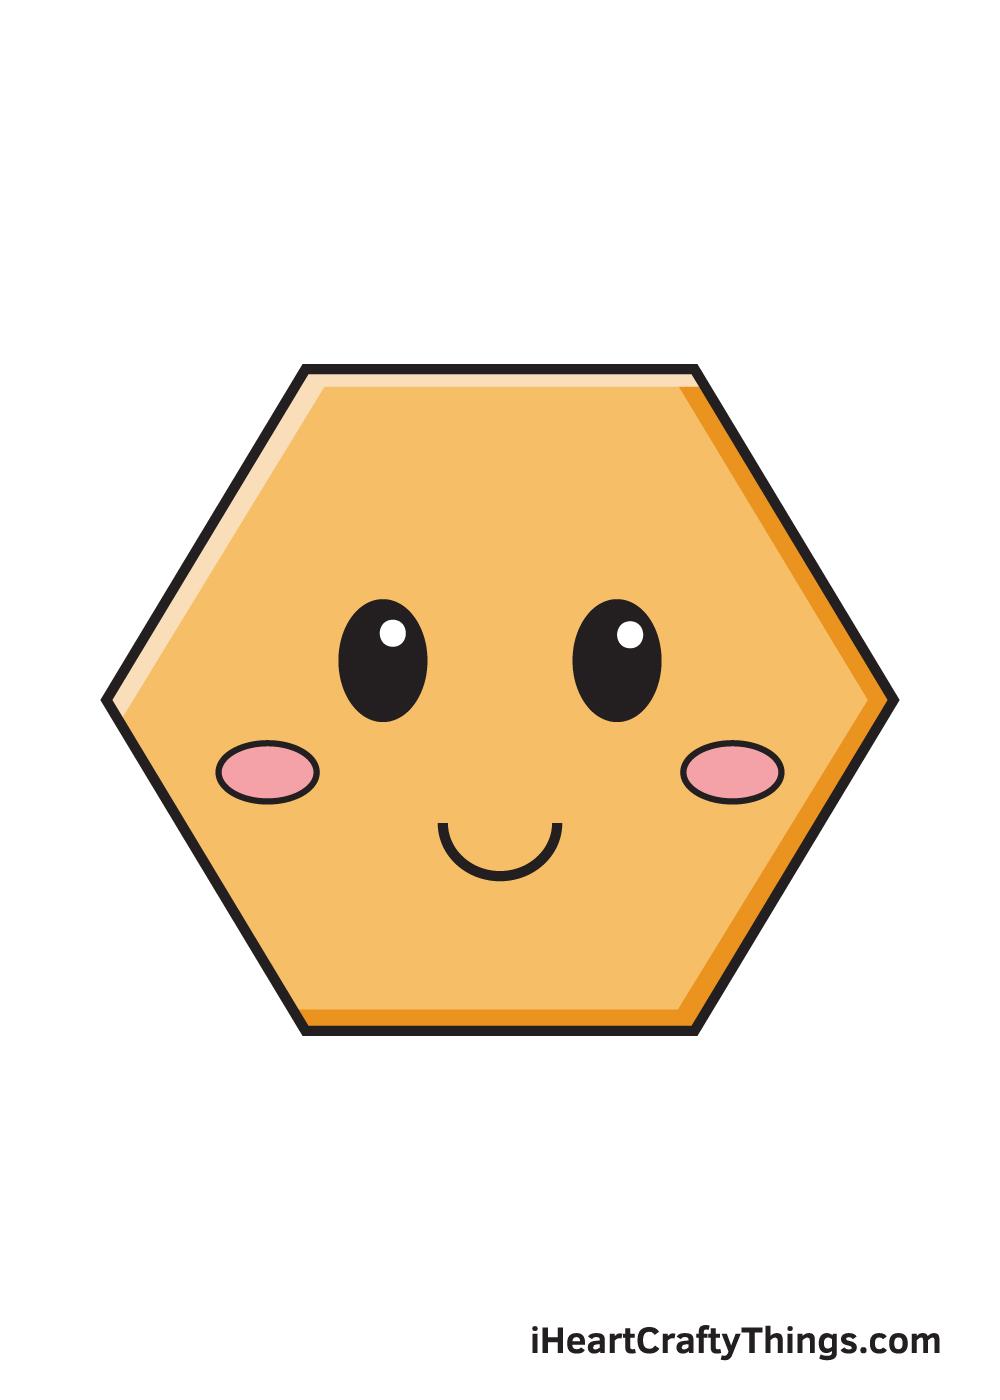 hexagon drawing 9 steps